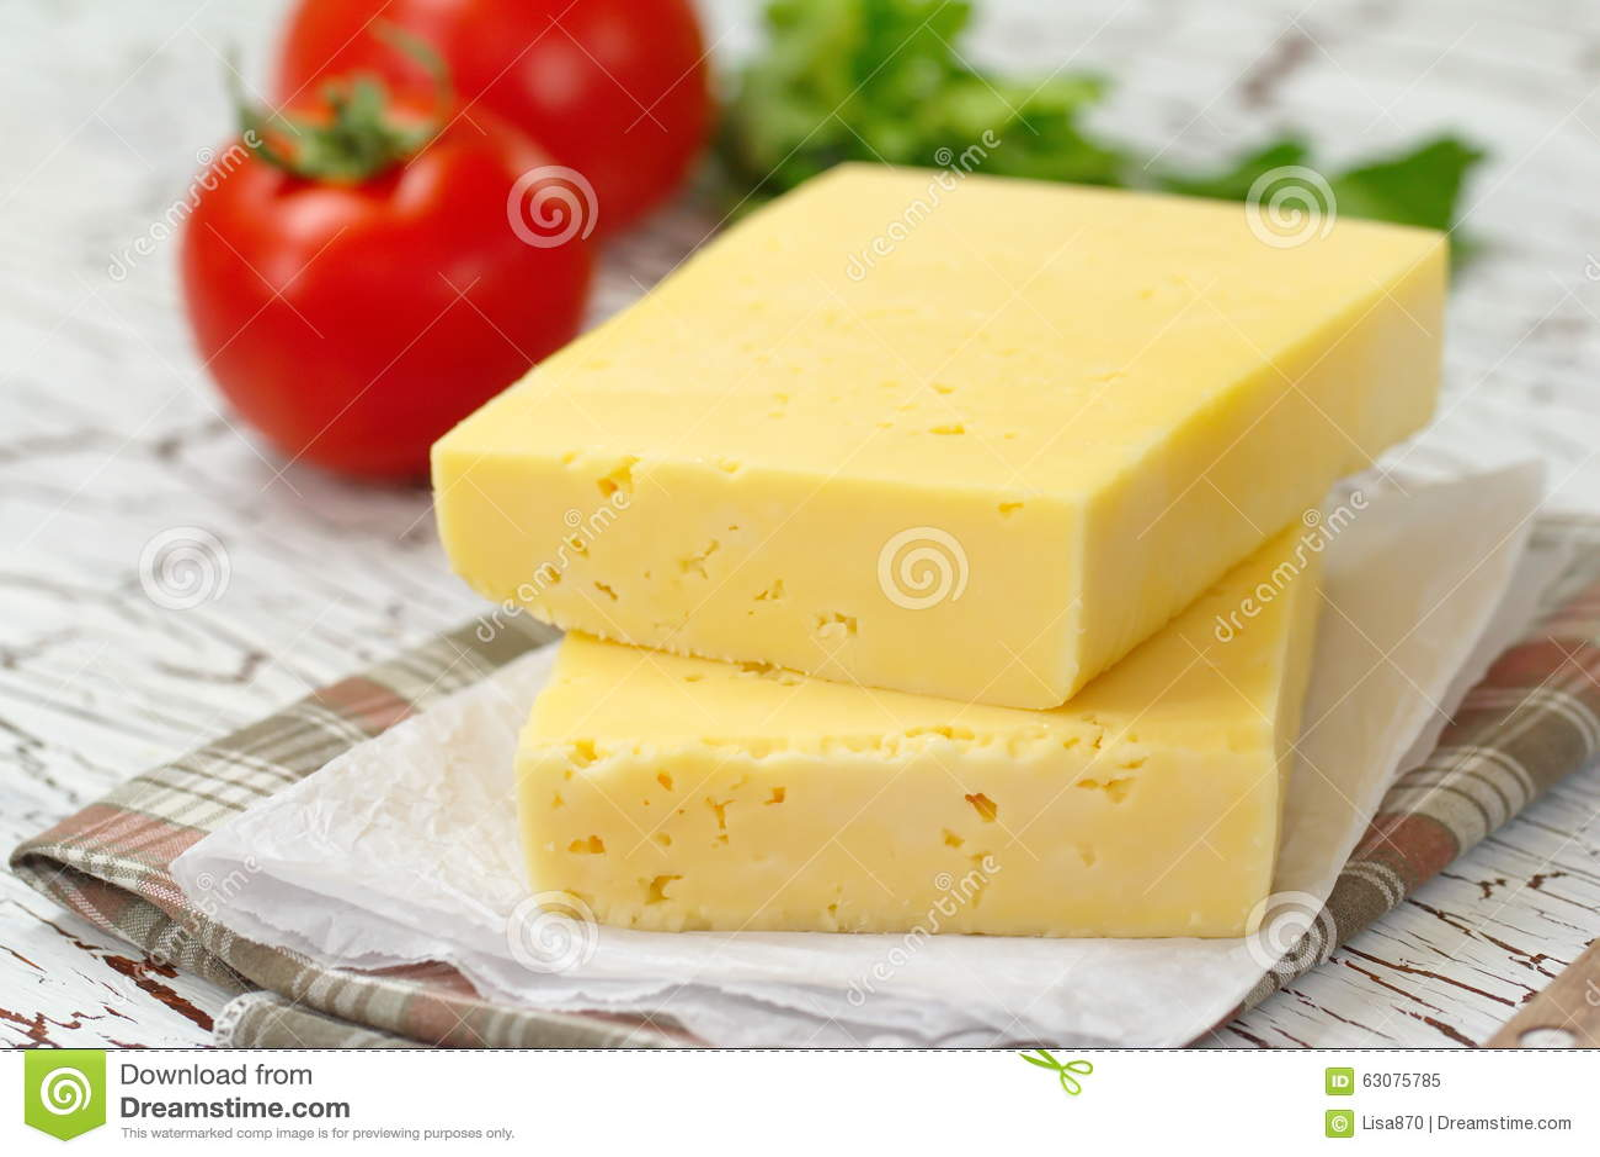 Download Fromage et légumes image stock. Image du fond, nourriture - 63075785